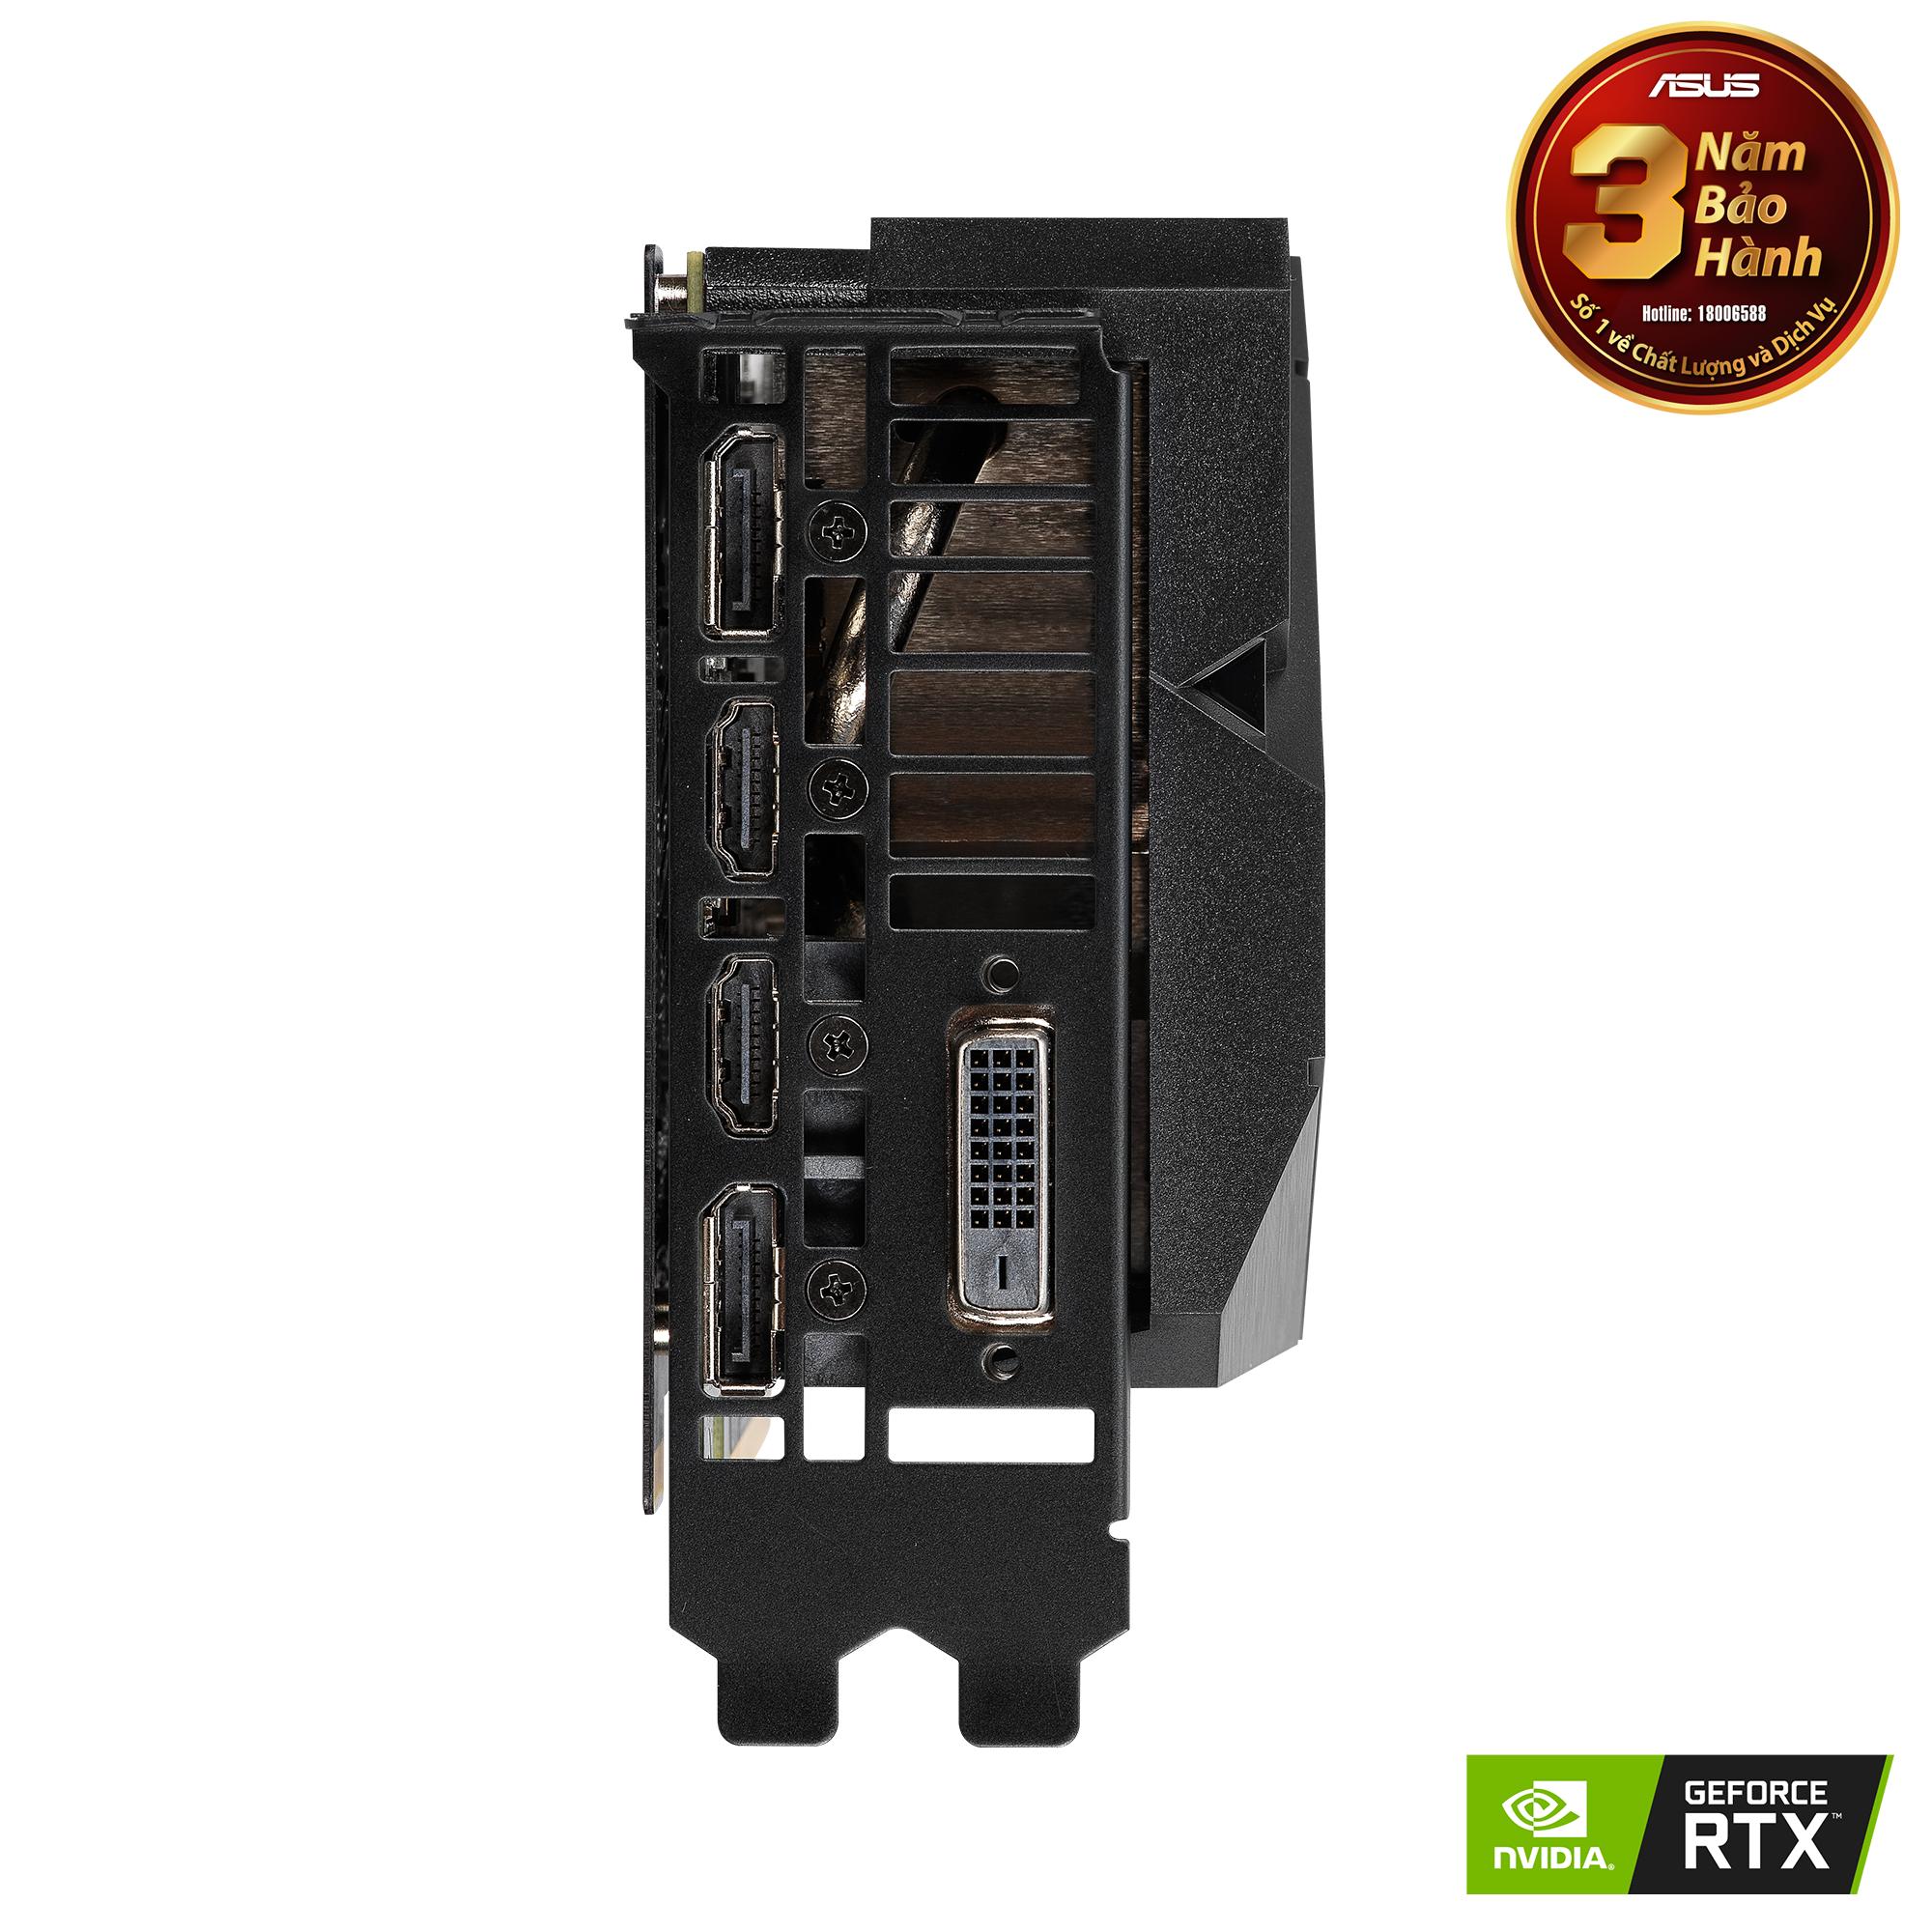 ASUS RTX 2060 SUPER DUAL EVO A8G GDDR6